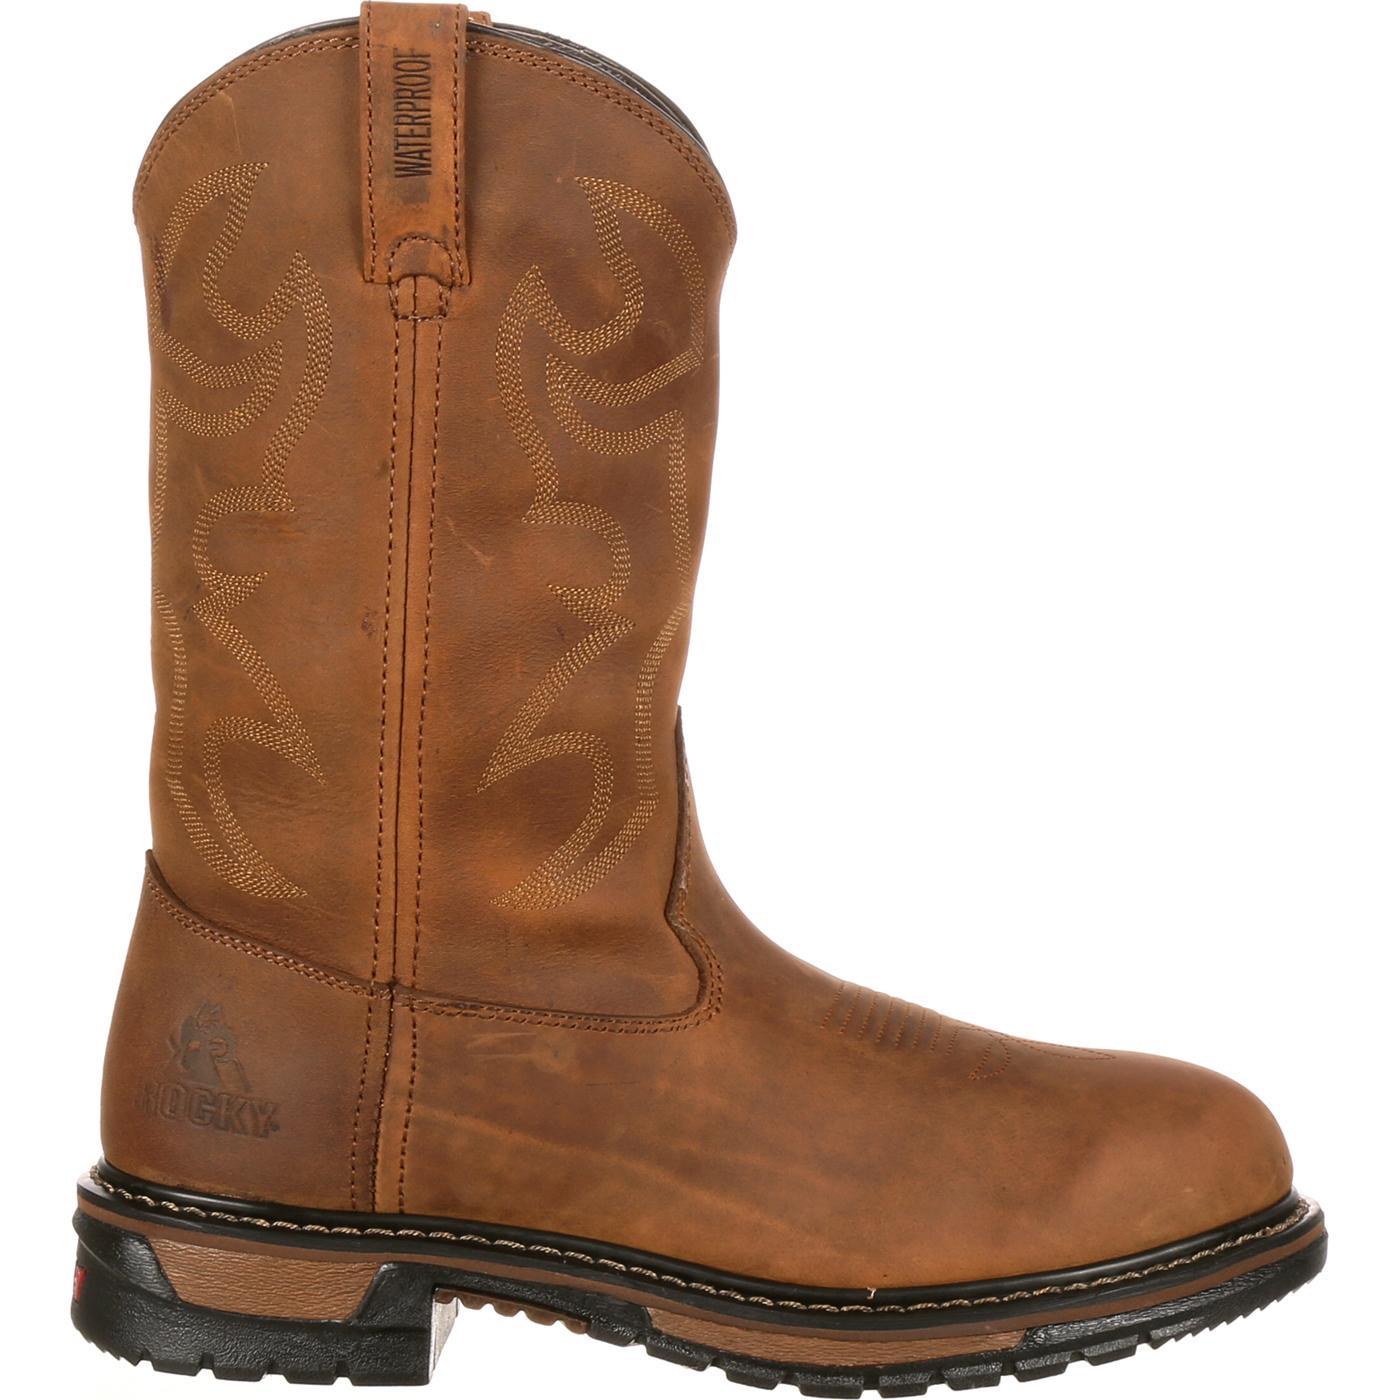 6792605f12b Rocky Original Ride Branson Roper Waterproof Western Boots